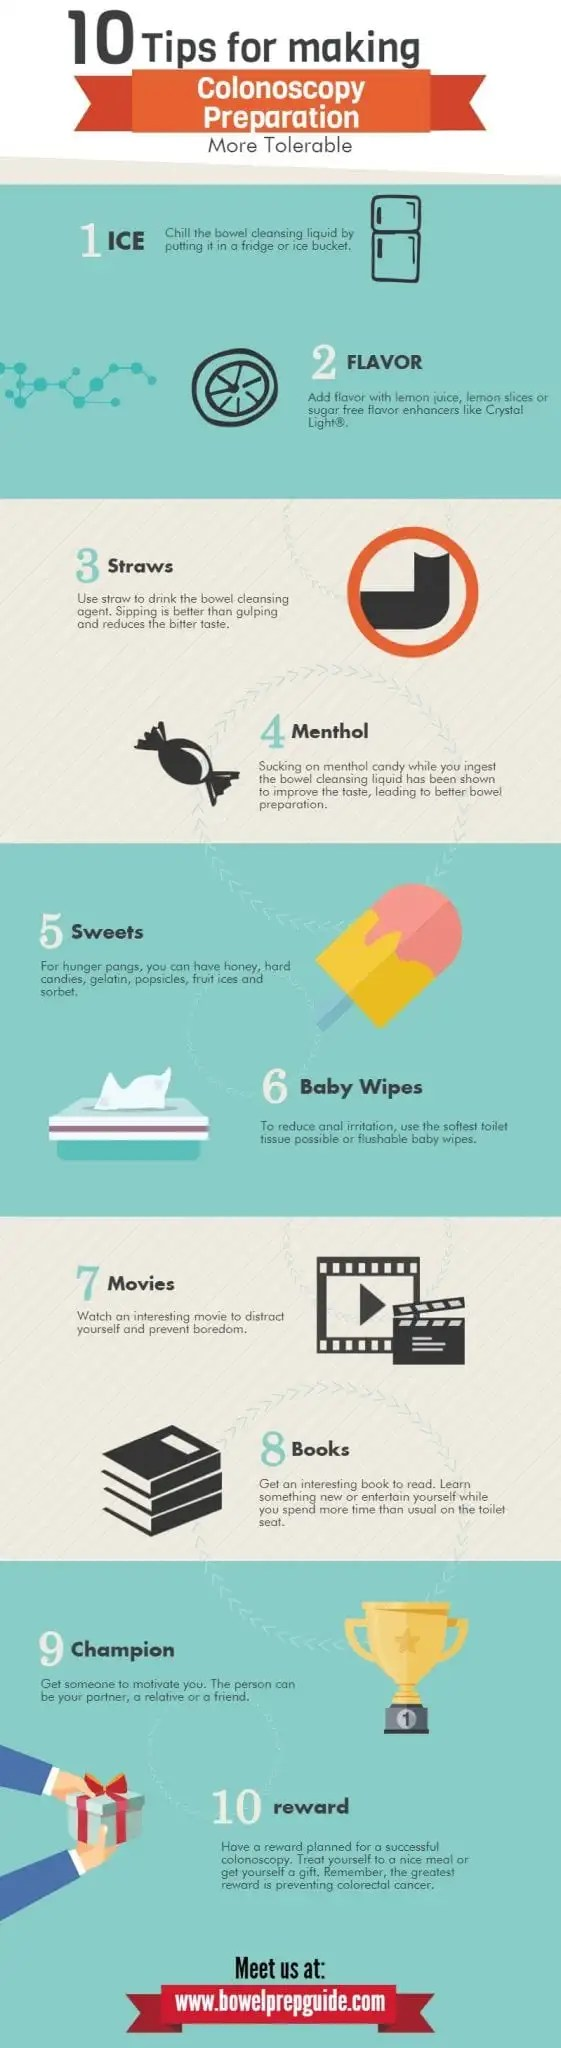 10 tips to make colonoscopy preparation more tolerable 2